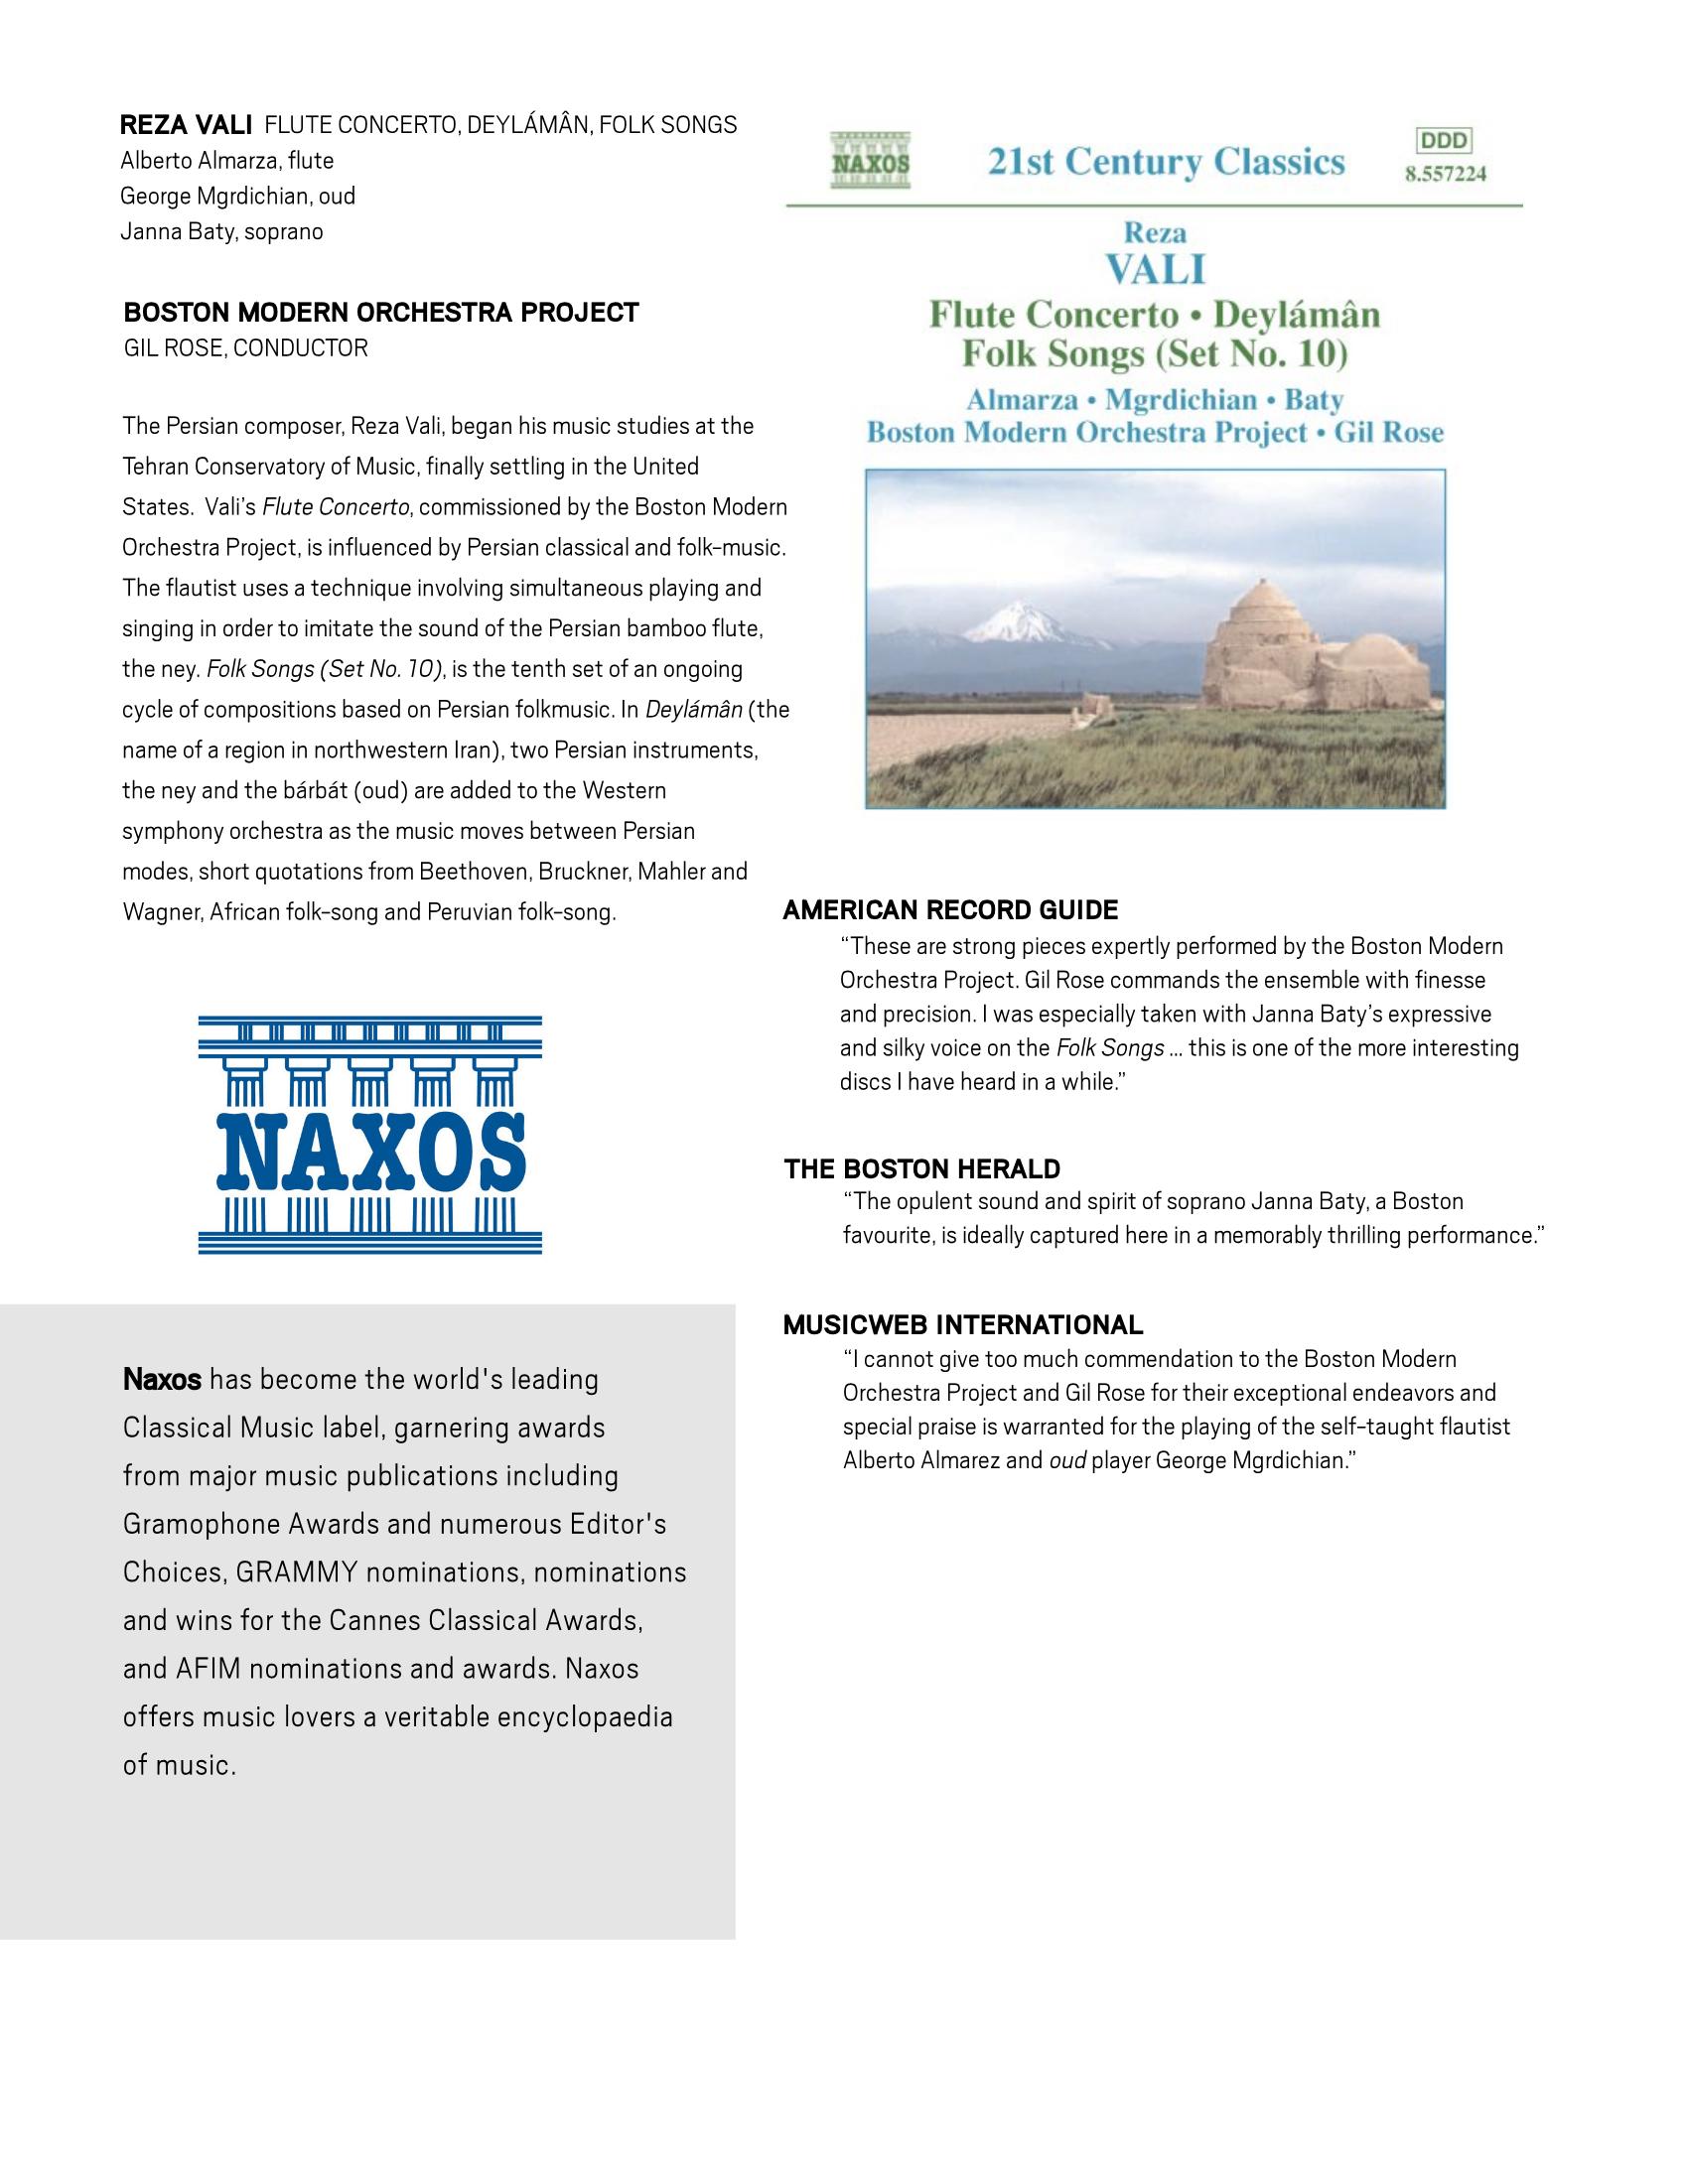 Vali - Naxos 8-557224 one-sheet.png